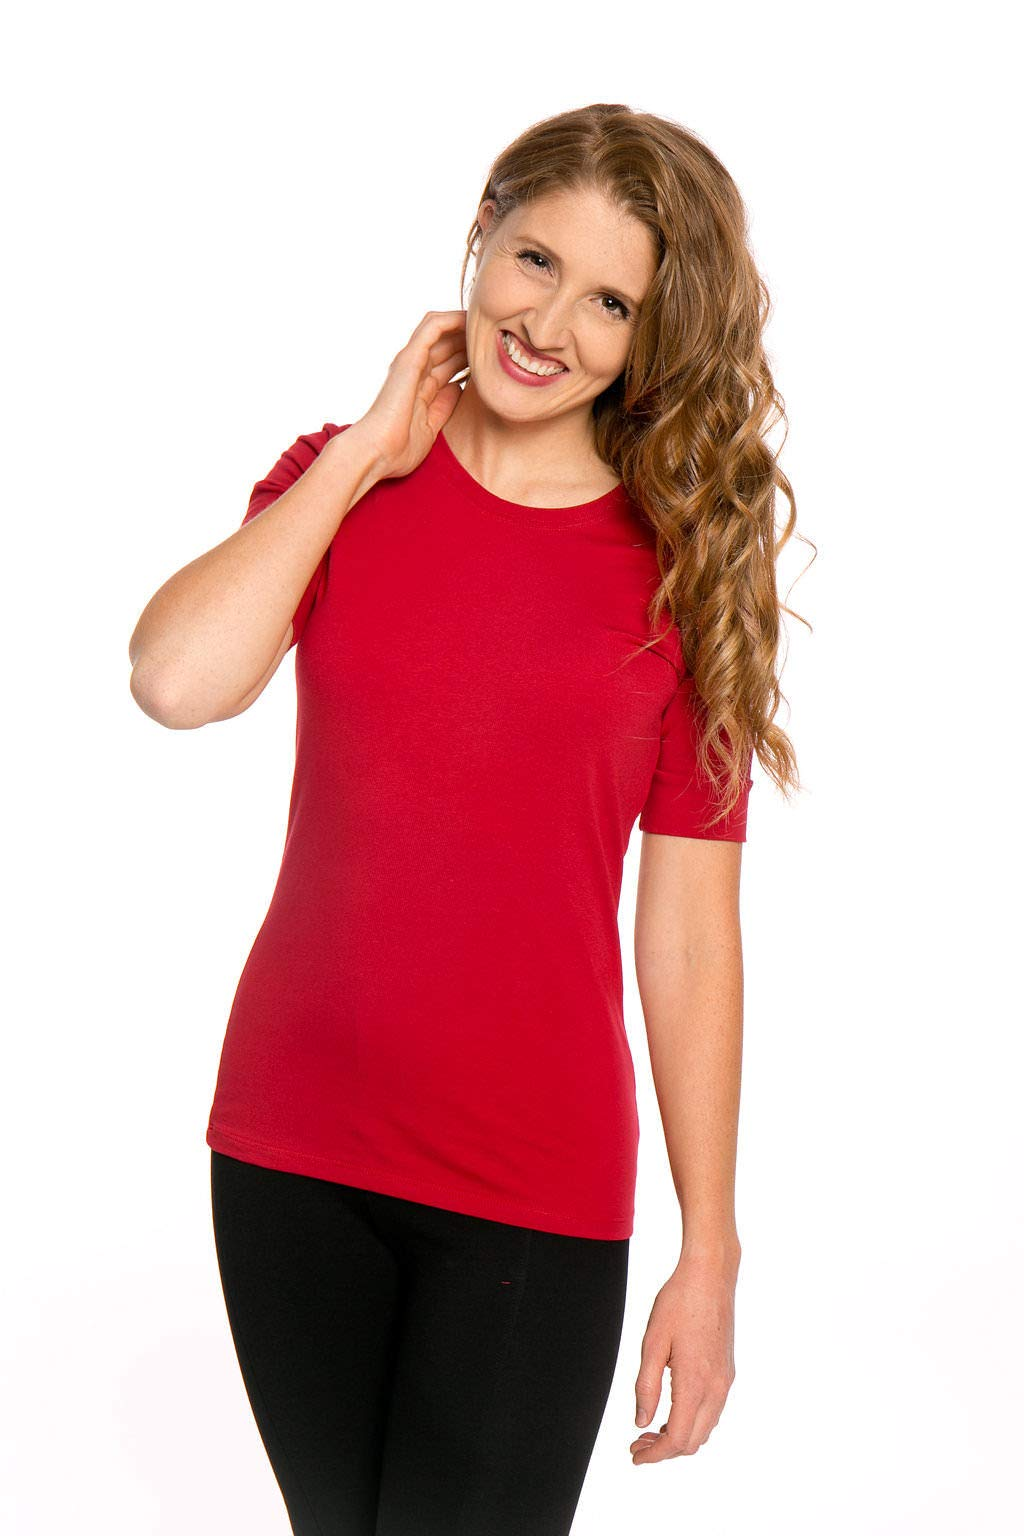 Heirloom Clothing 1/2 Sleeve Tango Red Medium